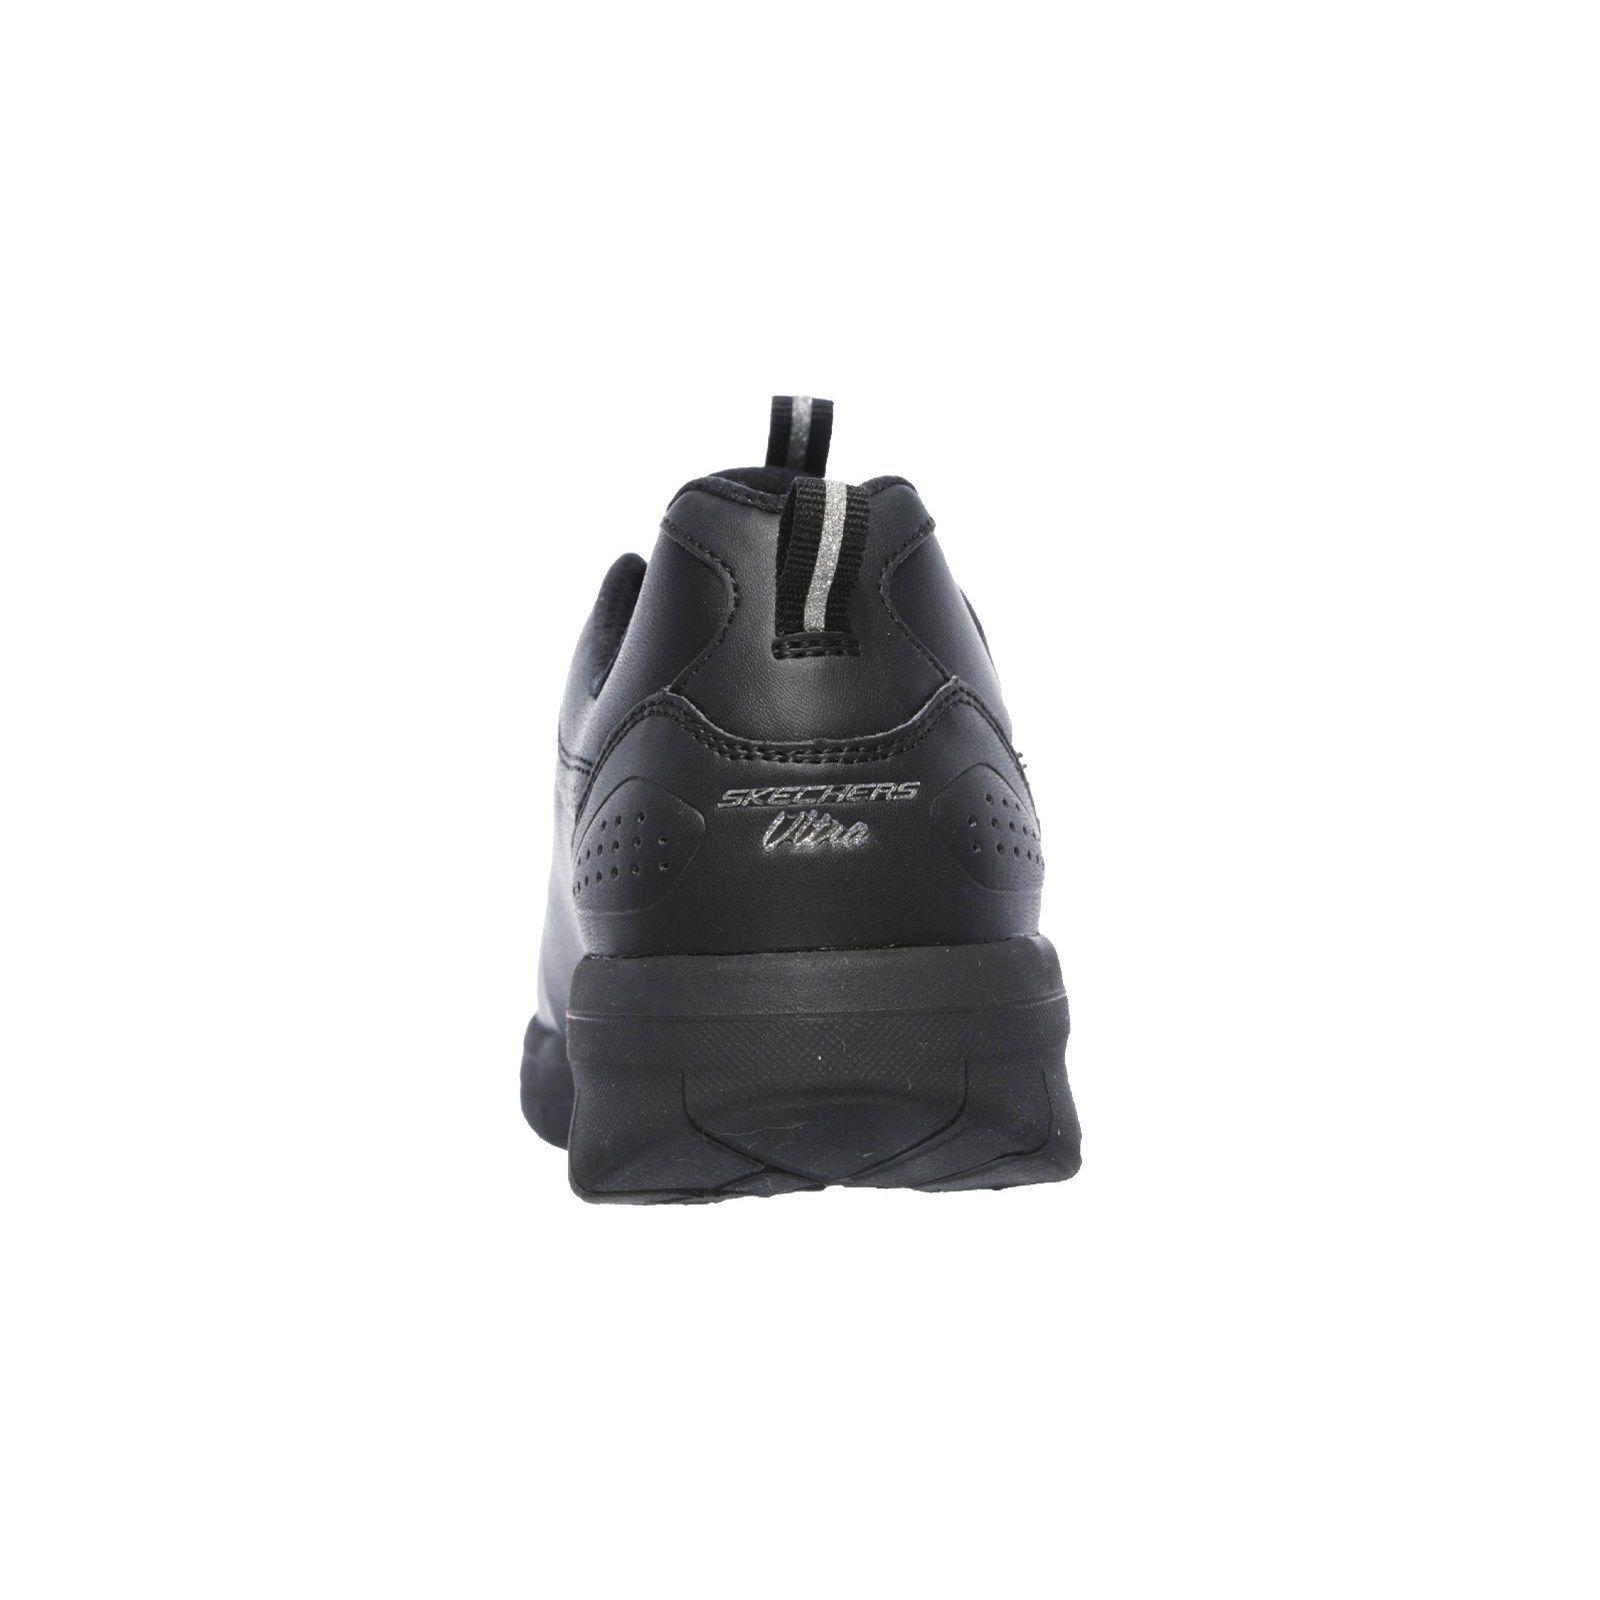 Skechers-Zapatillas-deportivas-Synergy-2-0-para-mujer-senora-FS4430 miniatura 4